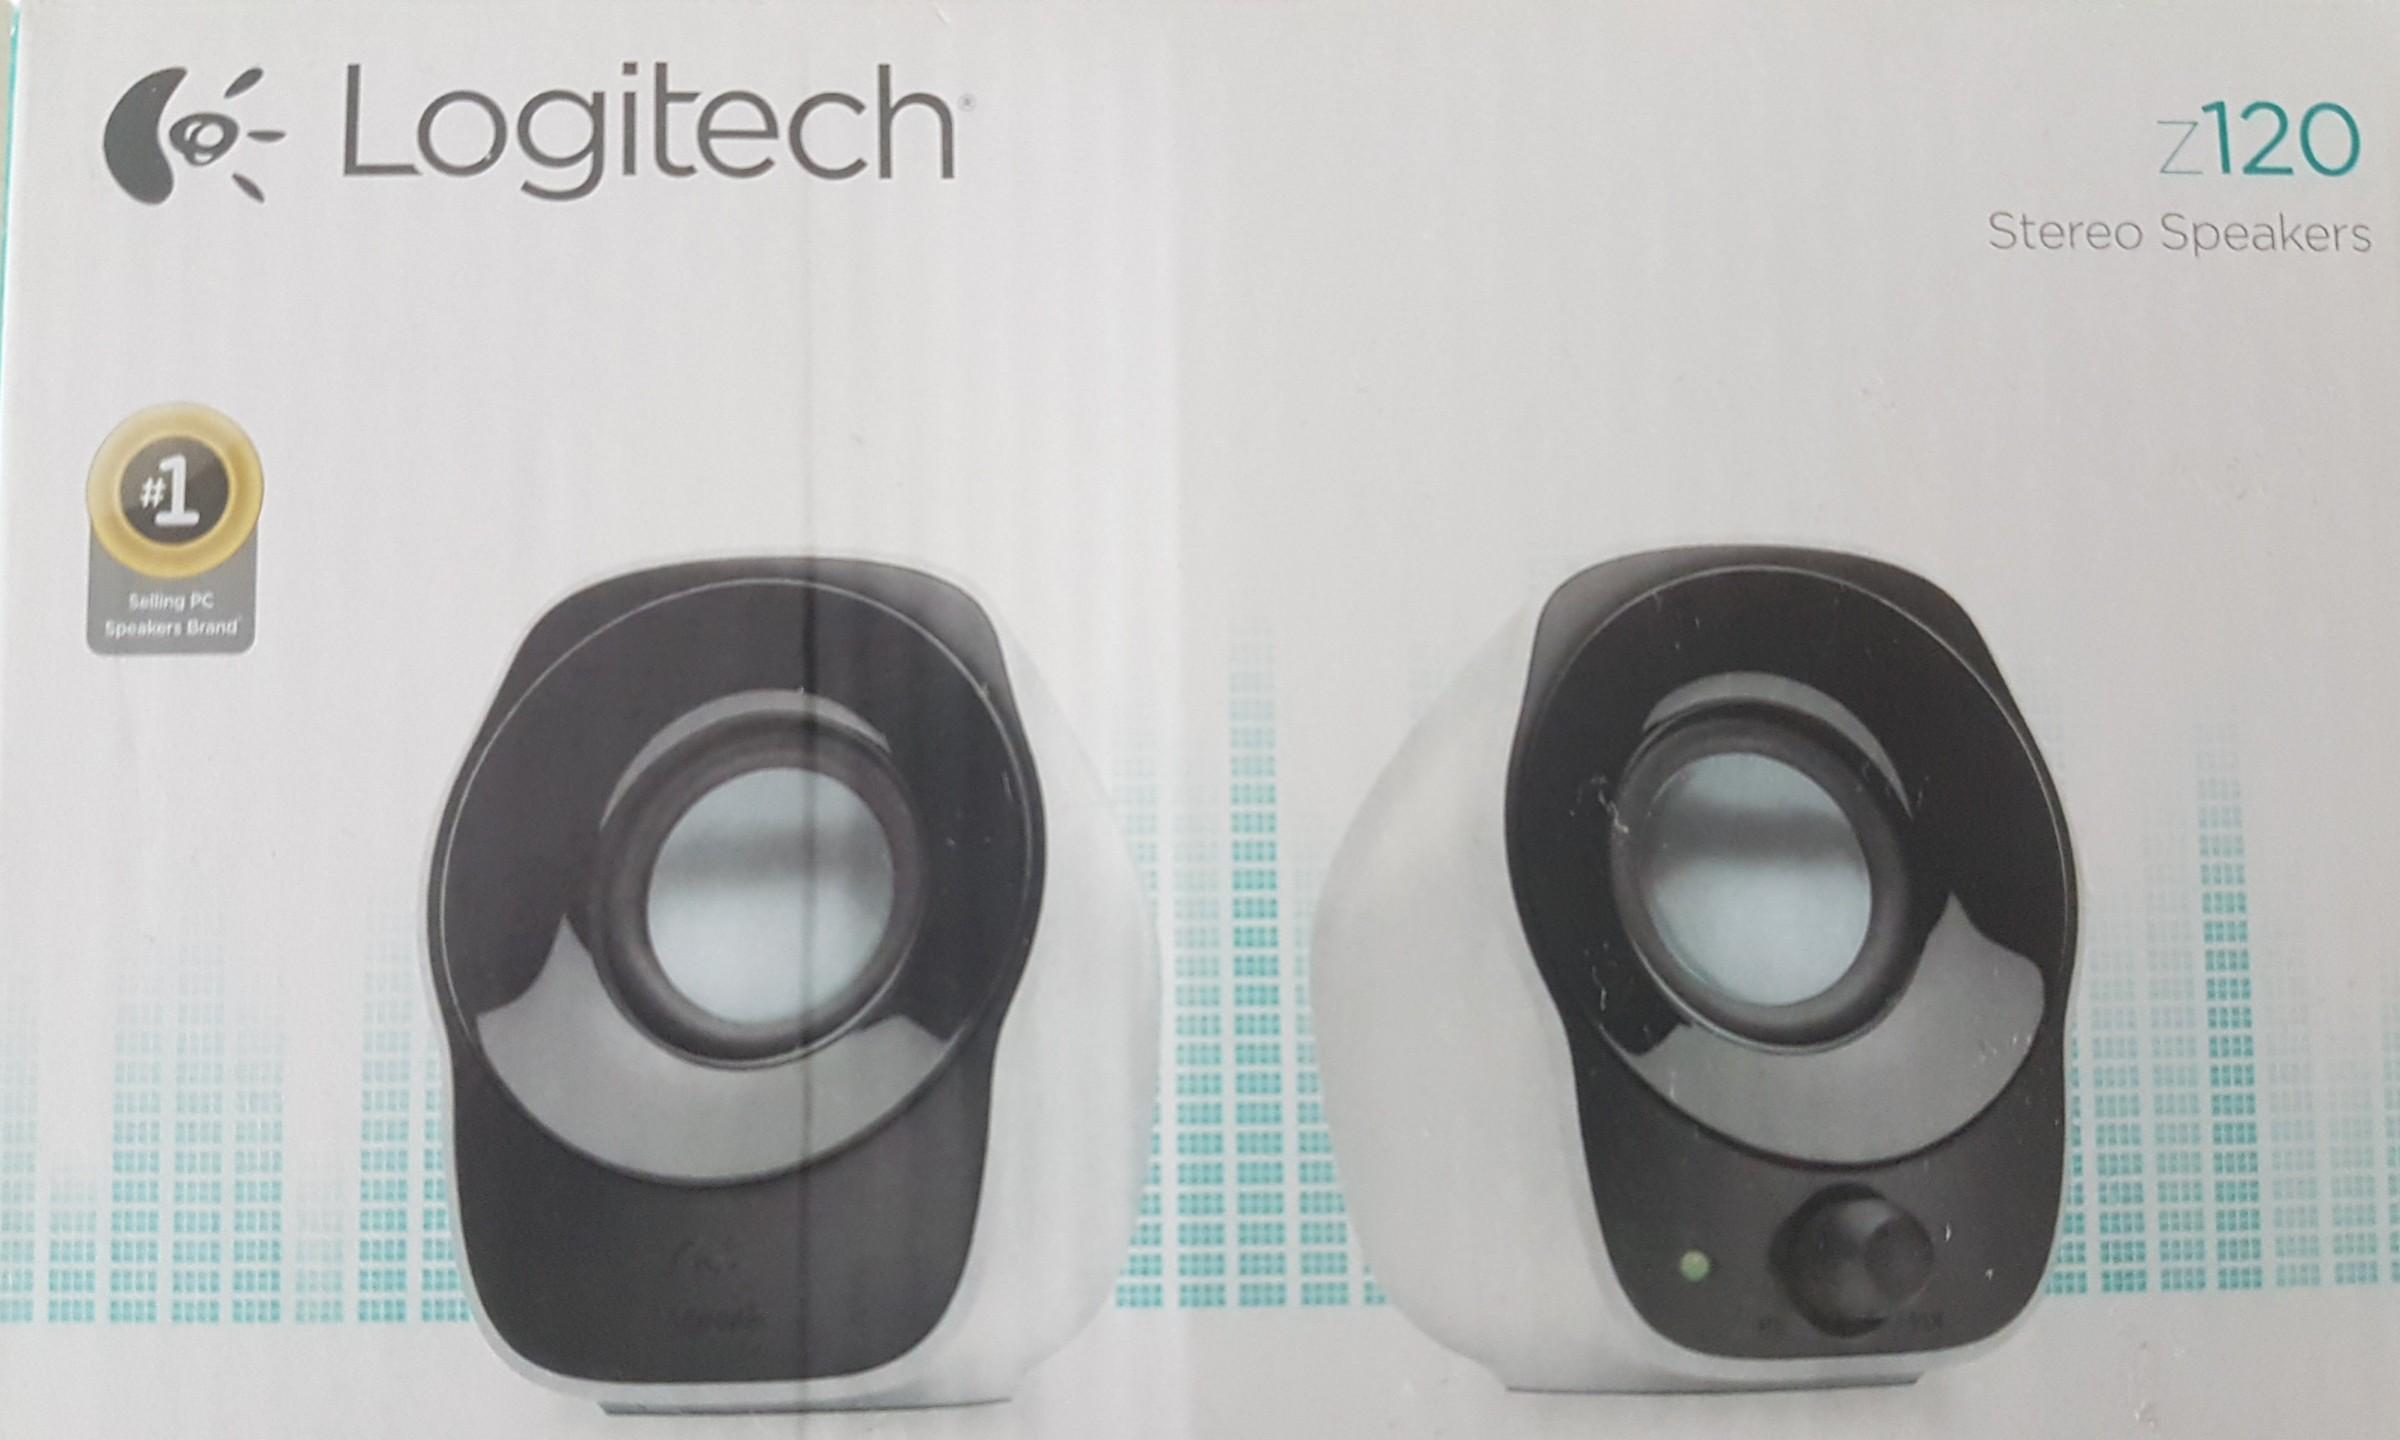 cb5127c9463 Logitech z120 Stereo Speakers, Electronics, Computer Parts ...